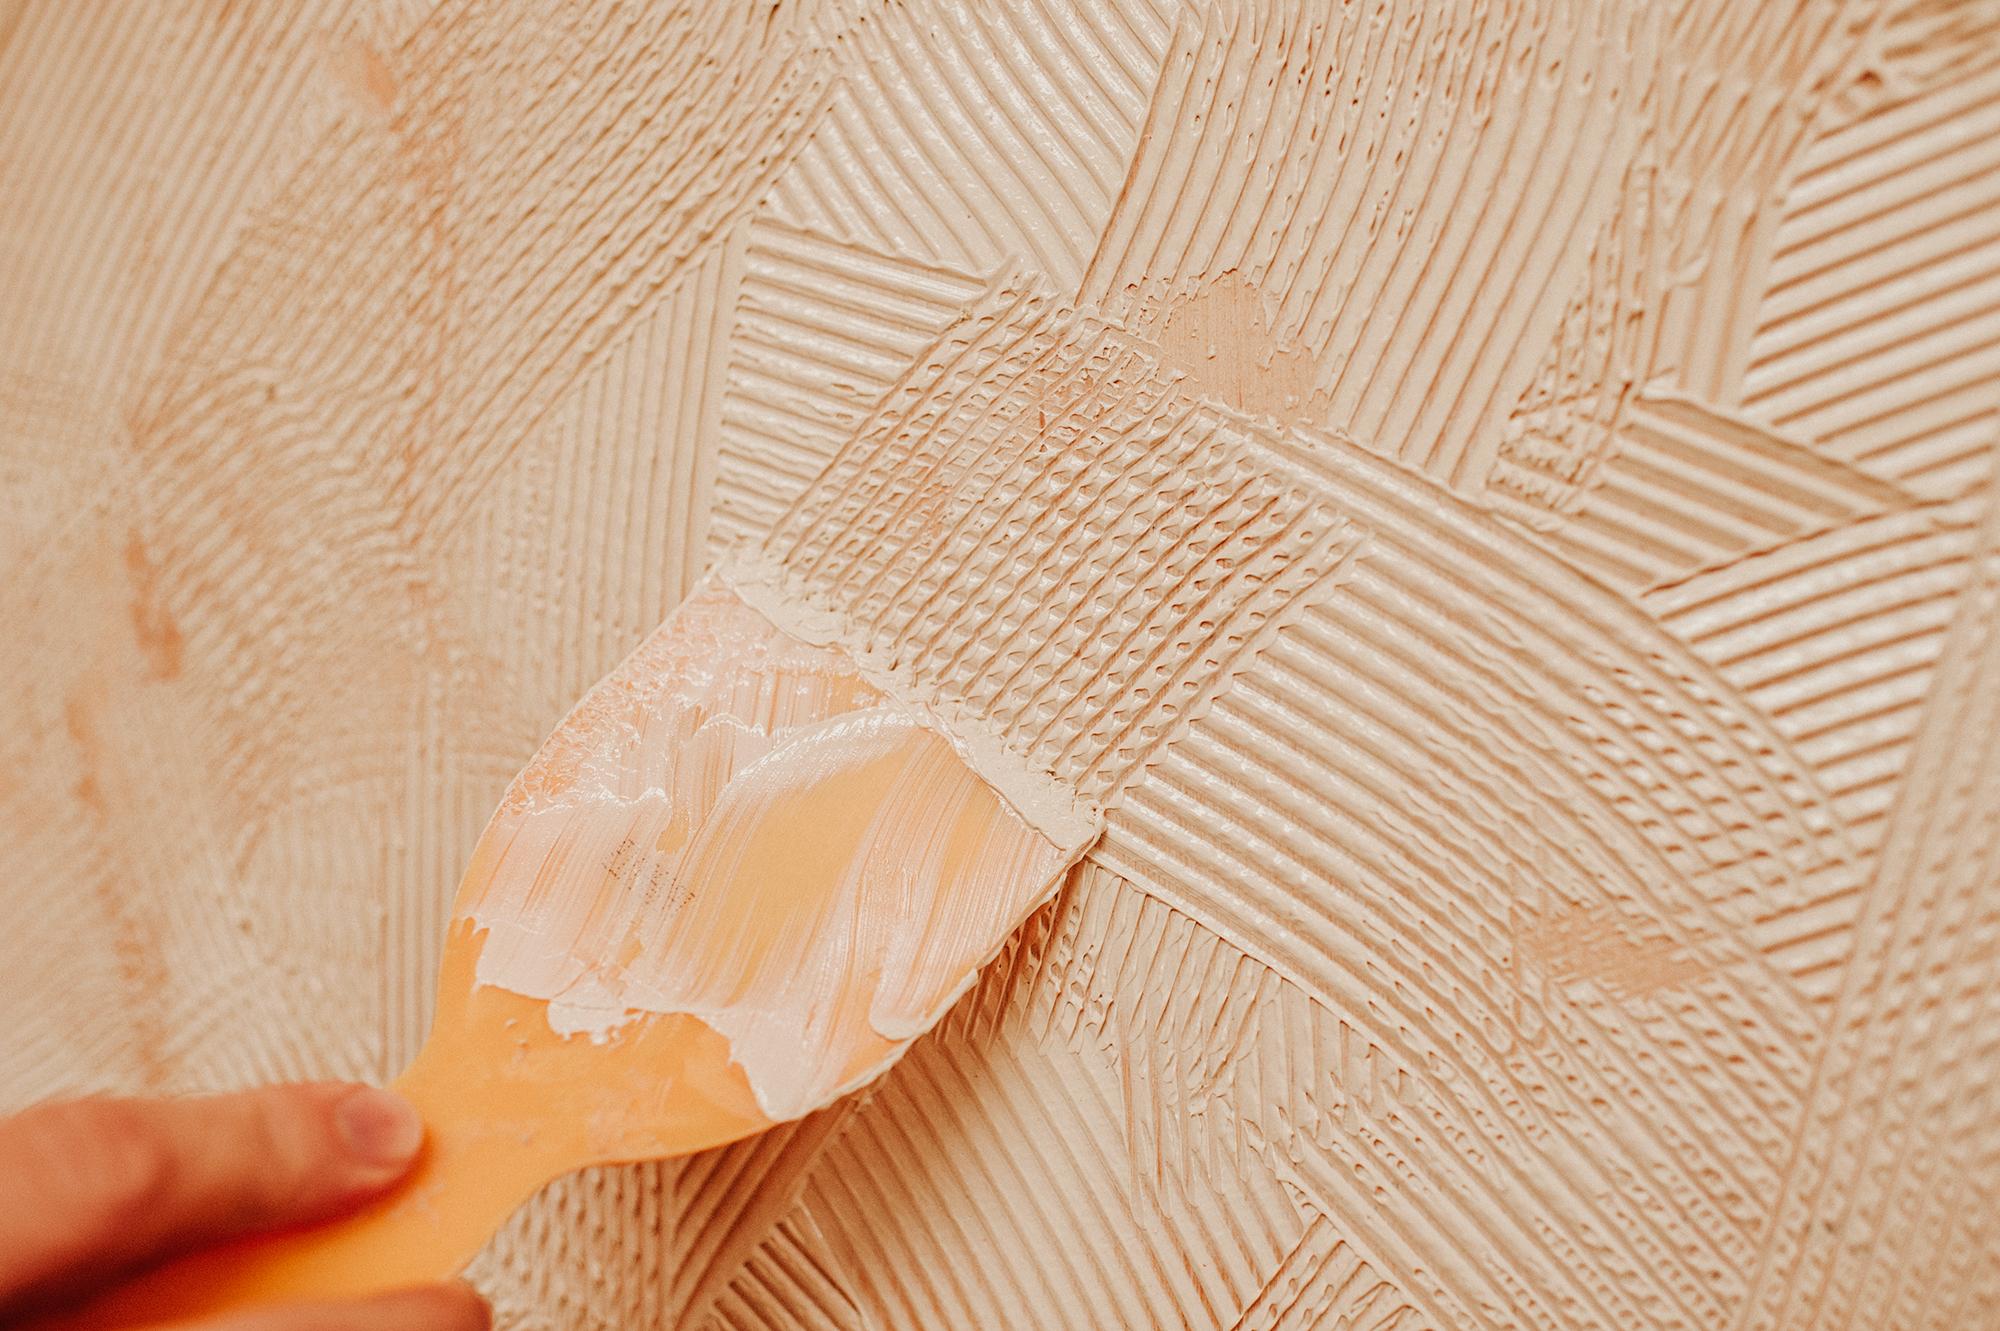 diy-corck-board-wall-troweled-adhesive-onto-plywood-board.jpg